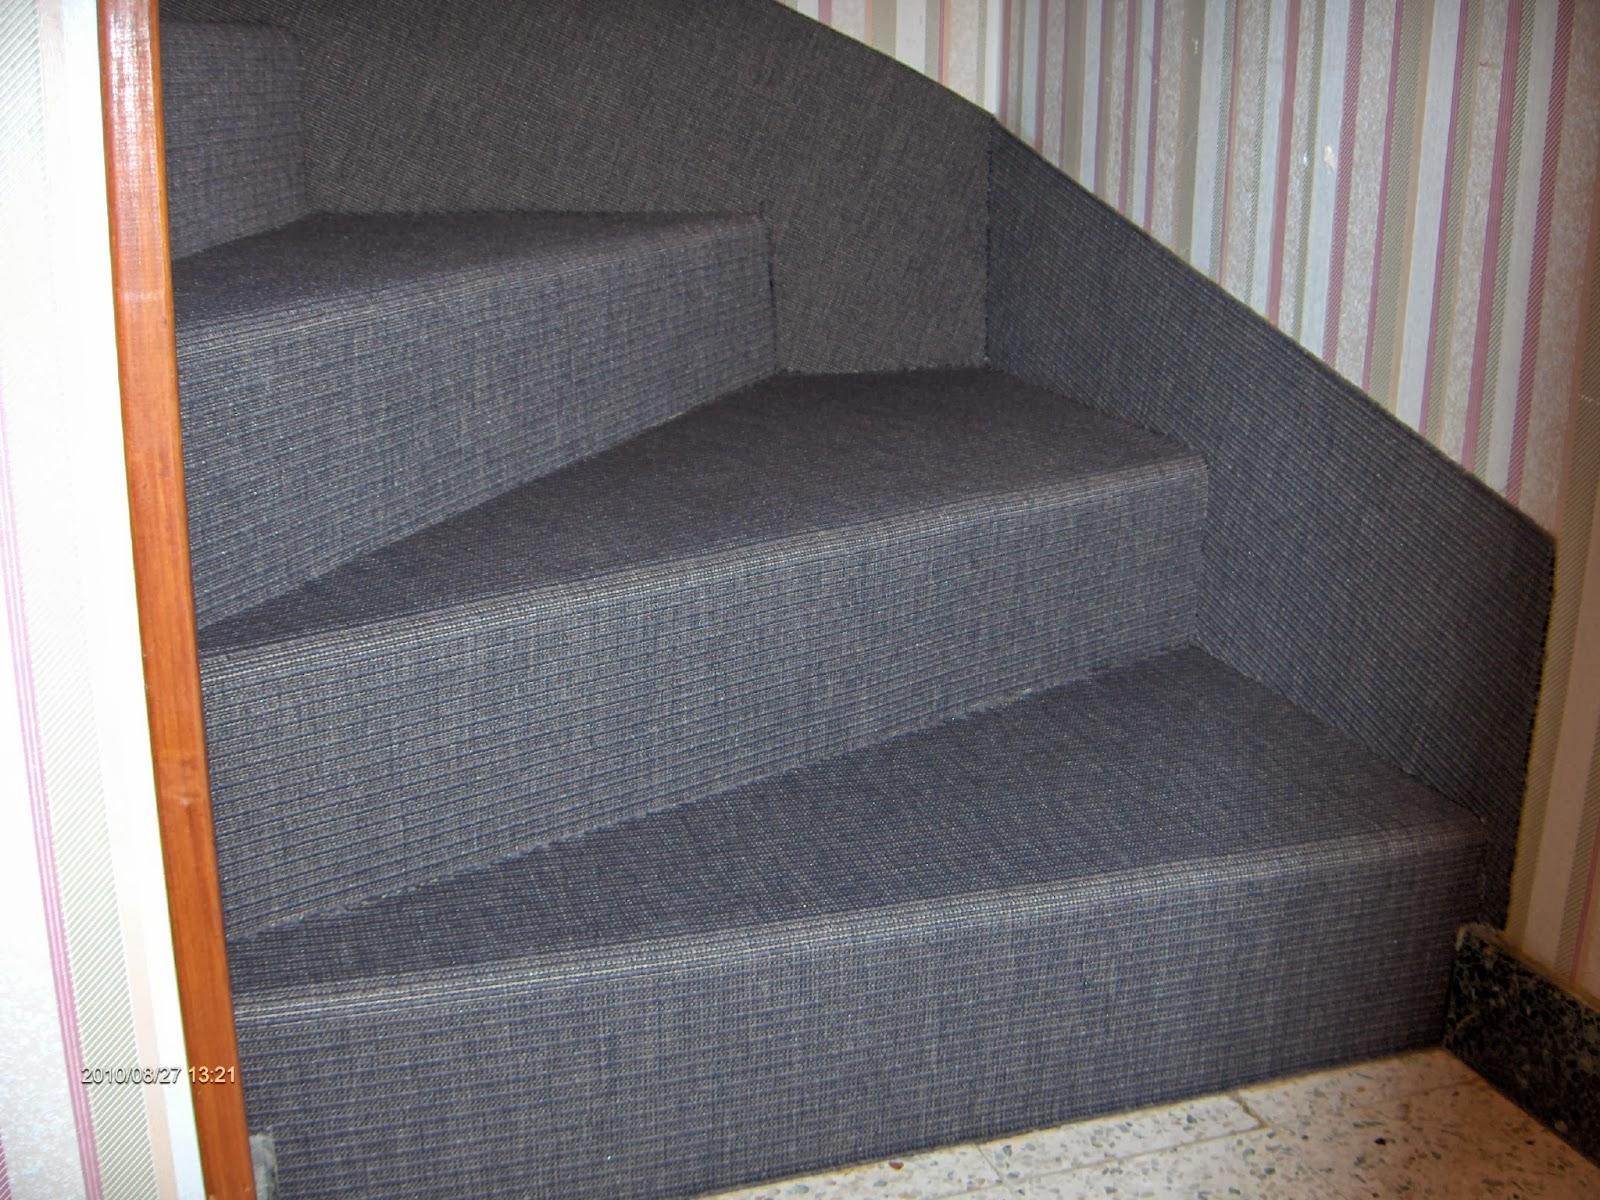 moquette pour escalier en bois in06 humatraffin. Black Bedroom Furniture Sets. Home Design Ideas